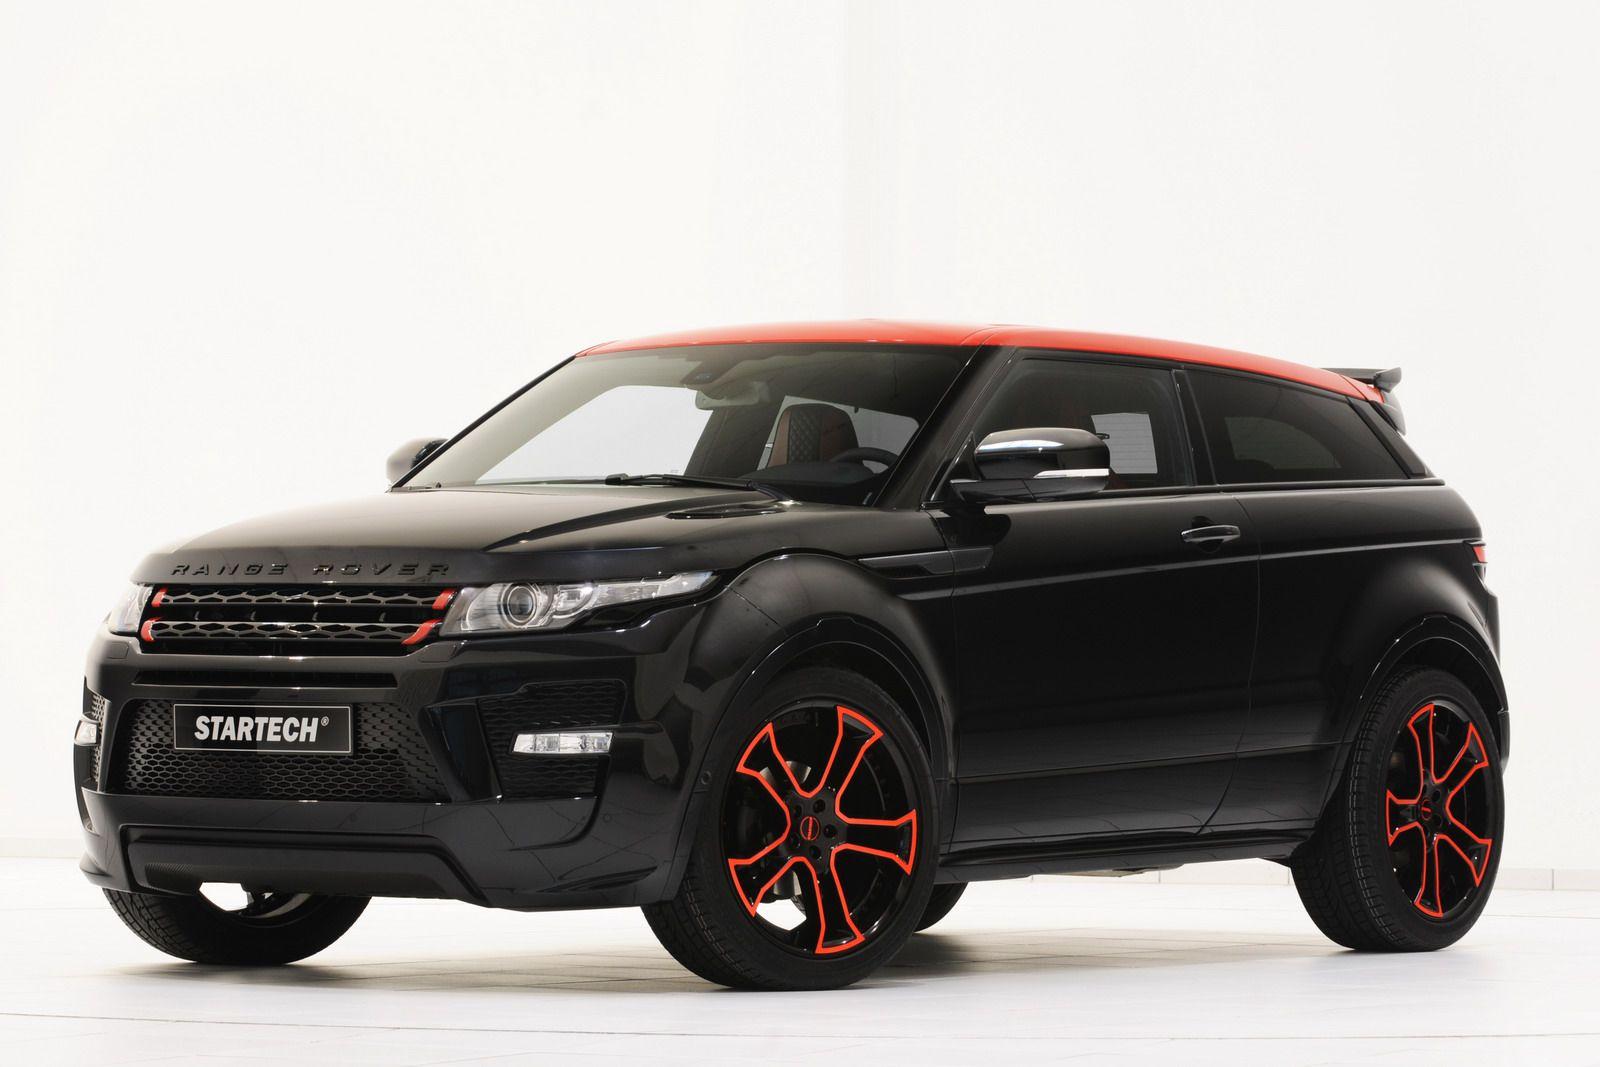 Startech Range Rover Evoque 레인지로버, 자동차